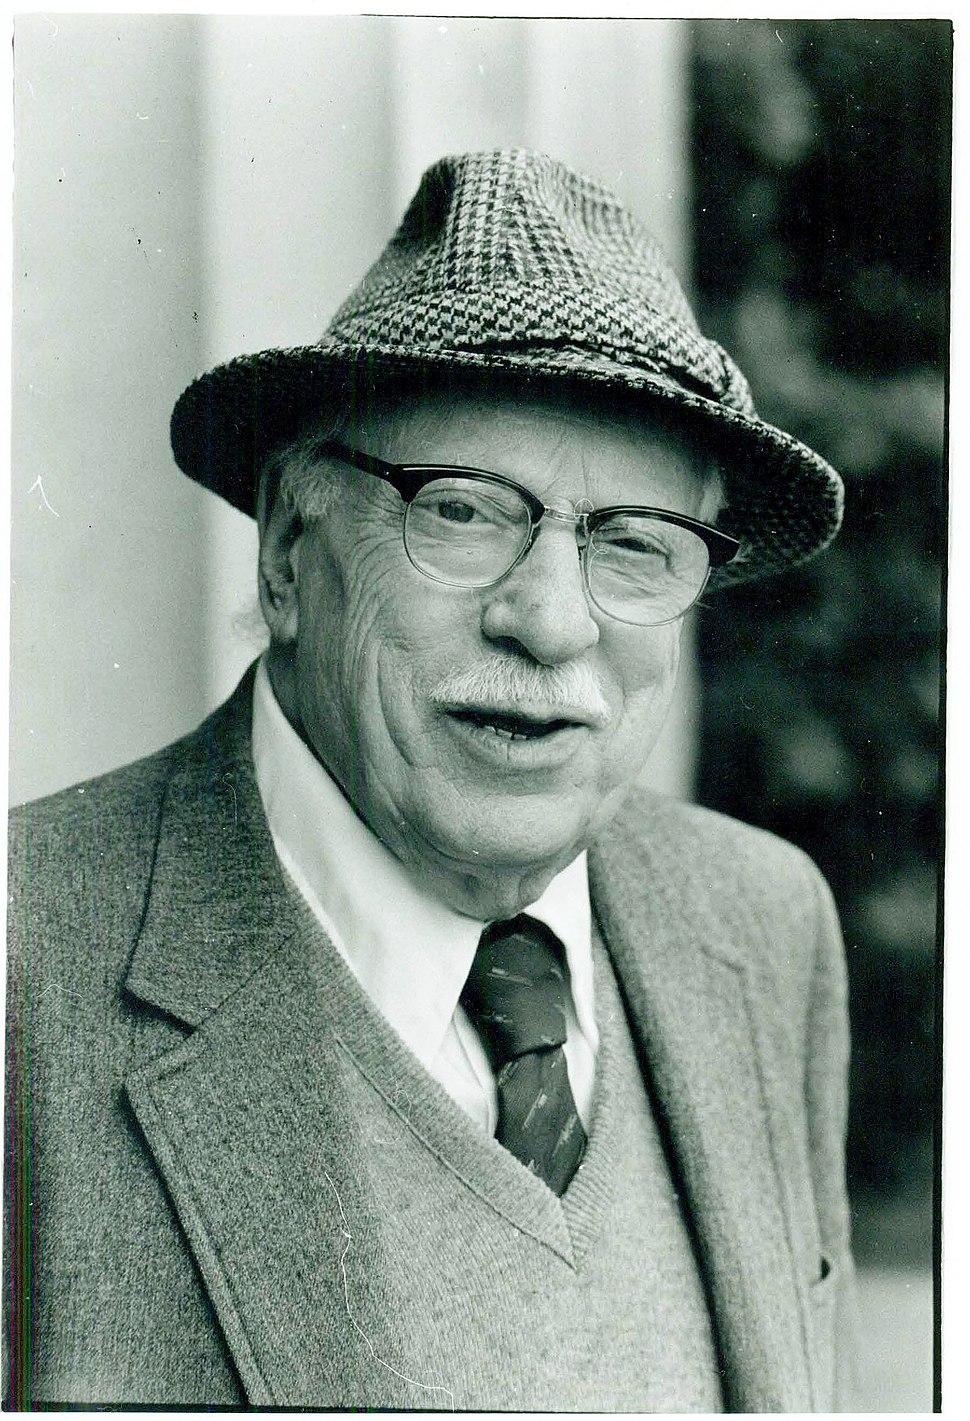 Joerosenthal1990